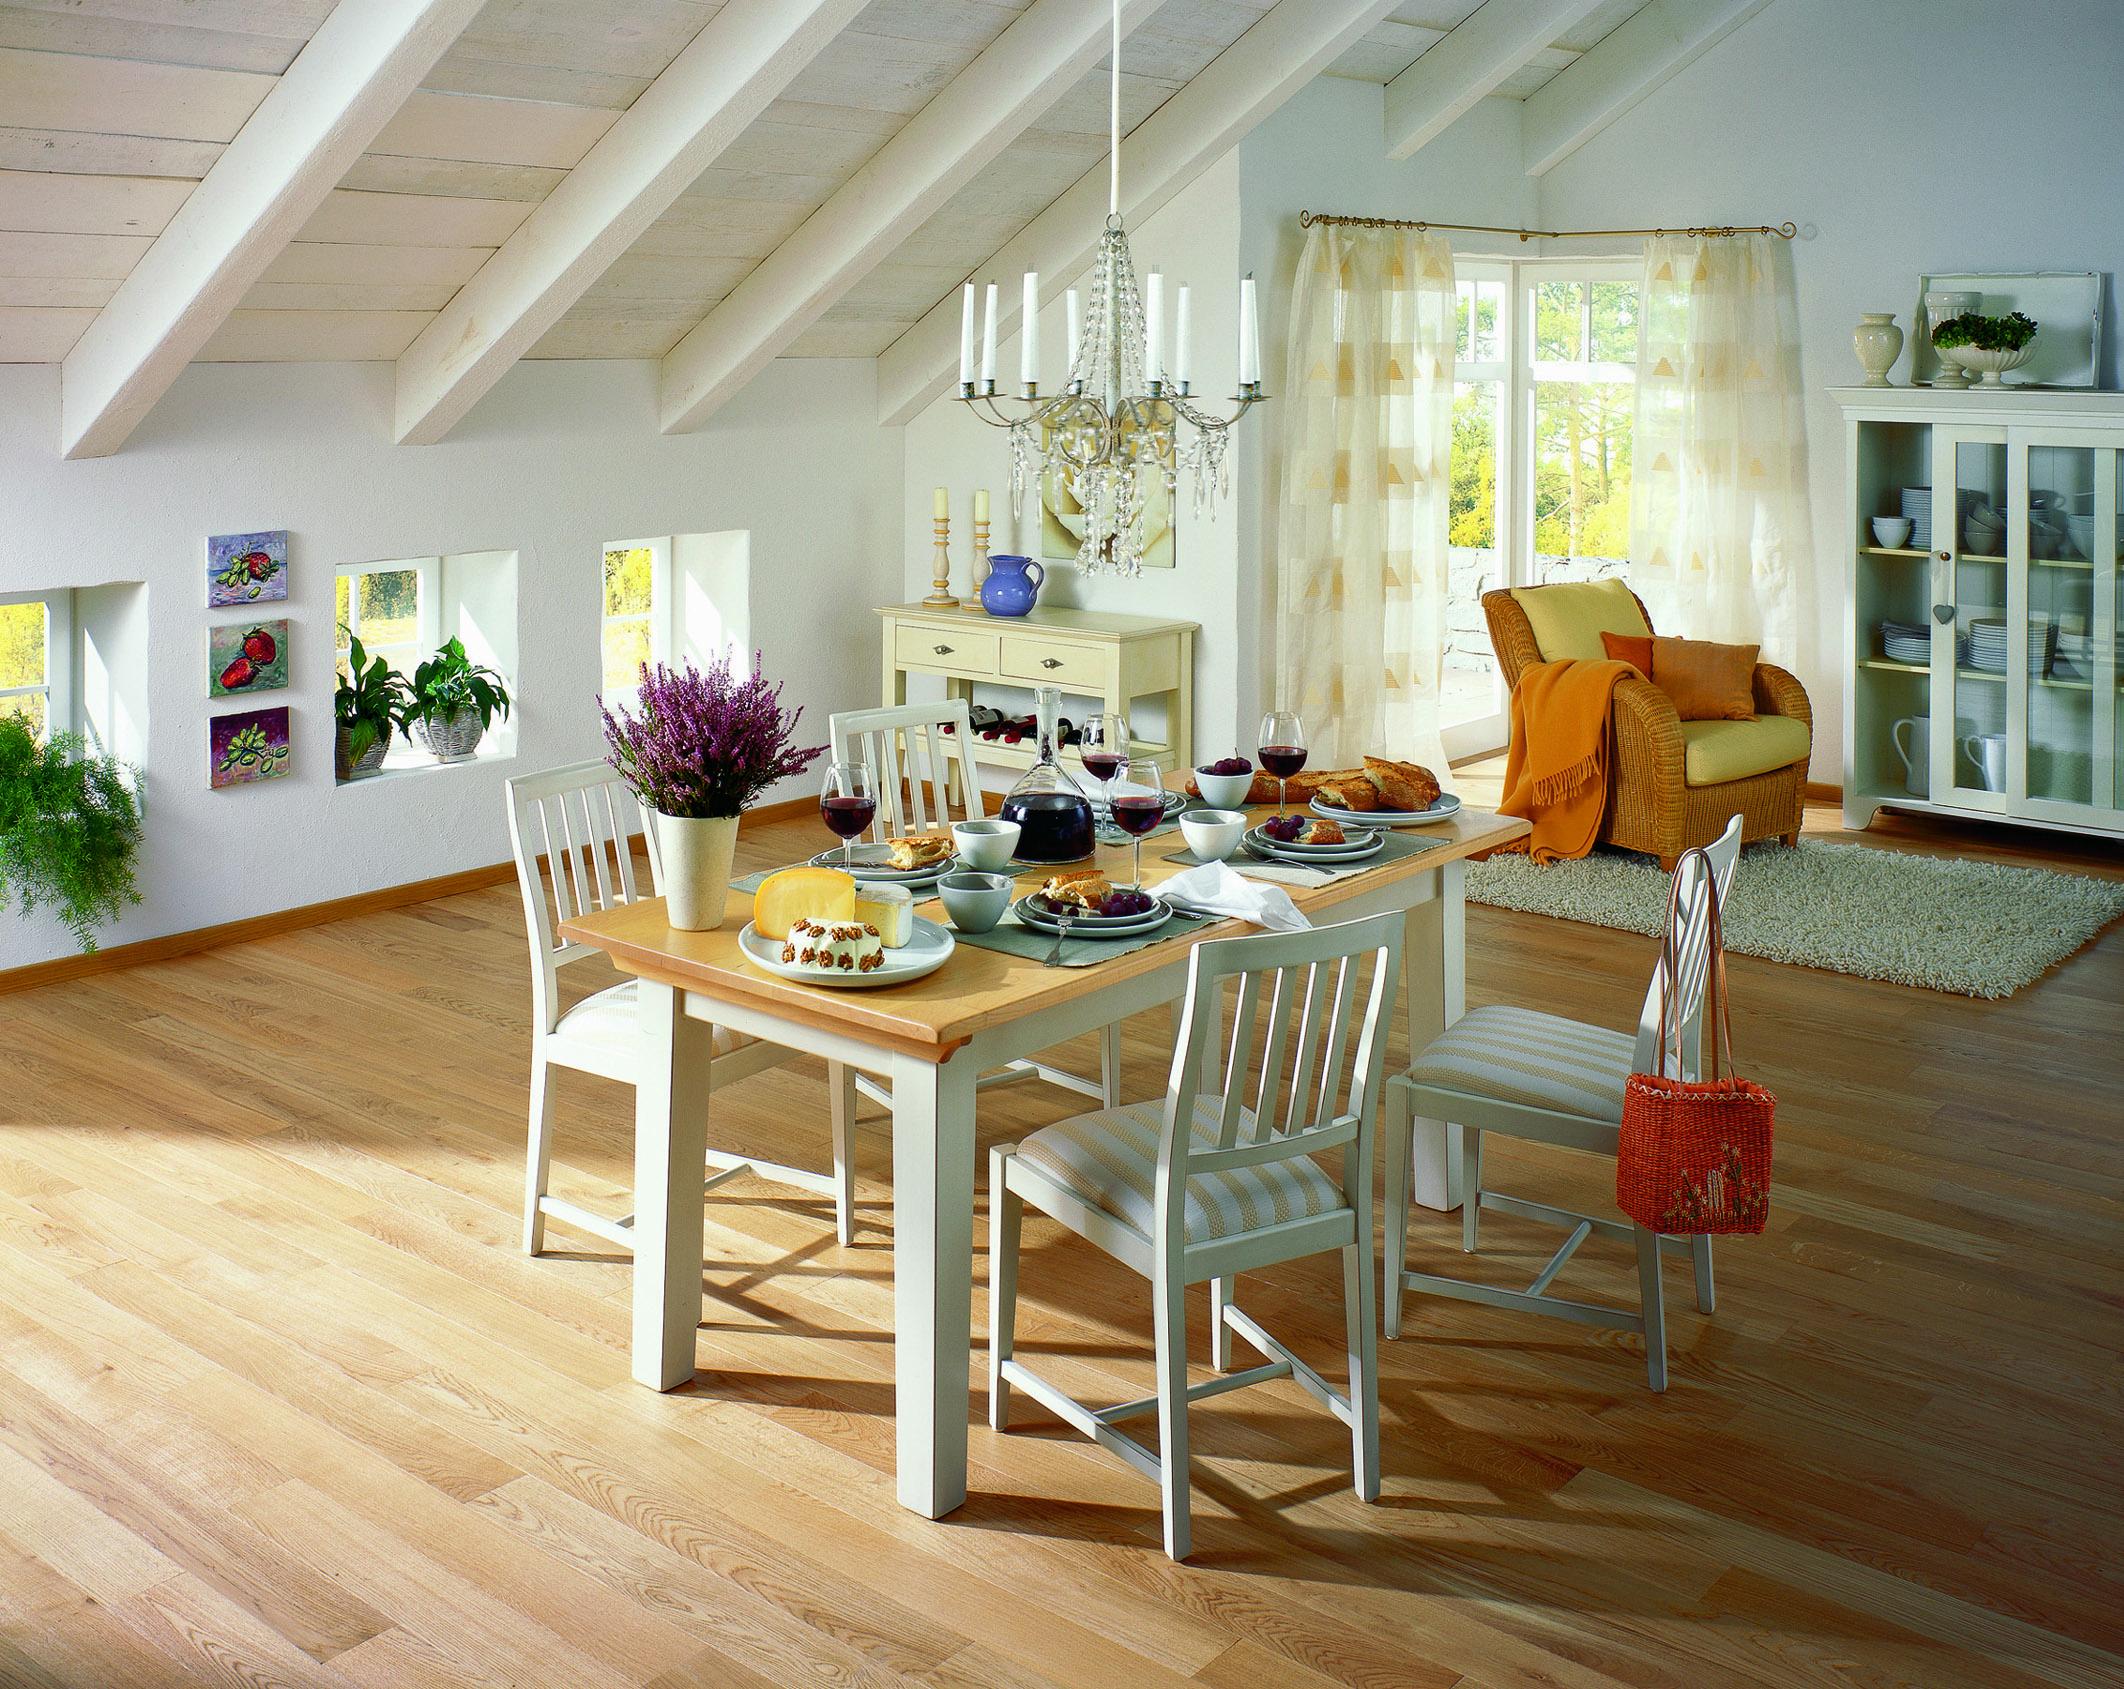 massivholzdielen selbst verlegen. Black Bedroom Furniture Sets. Home Design Ideas